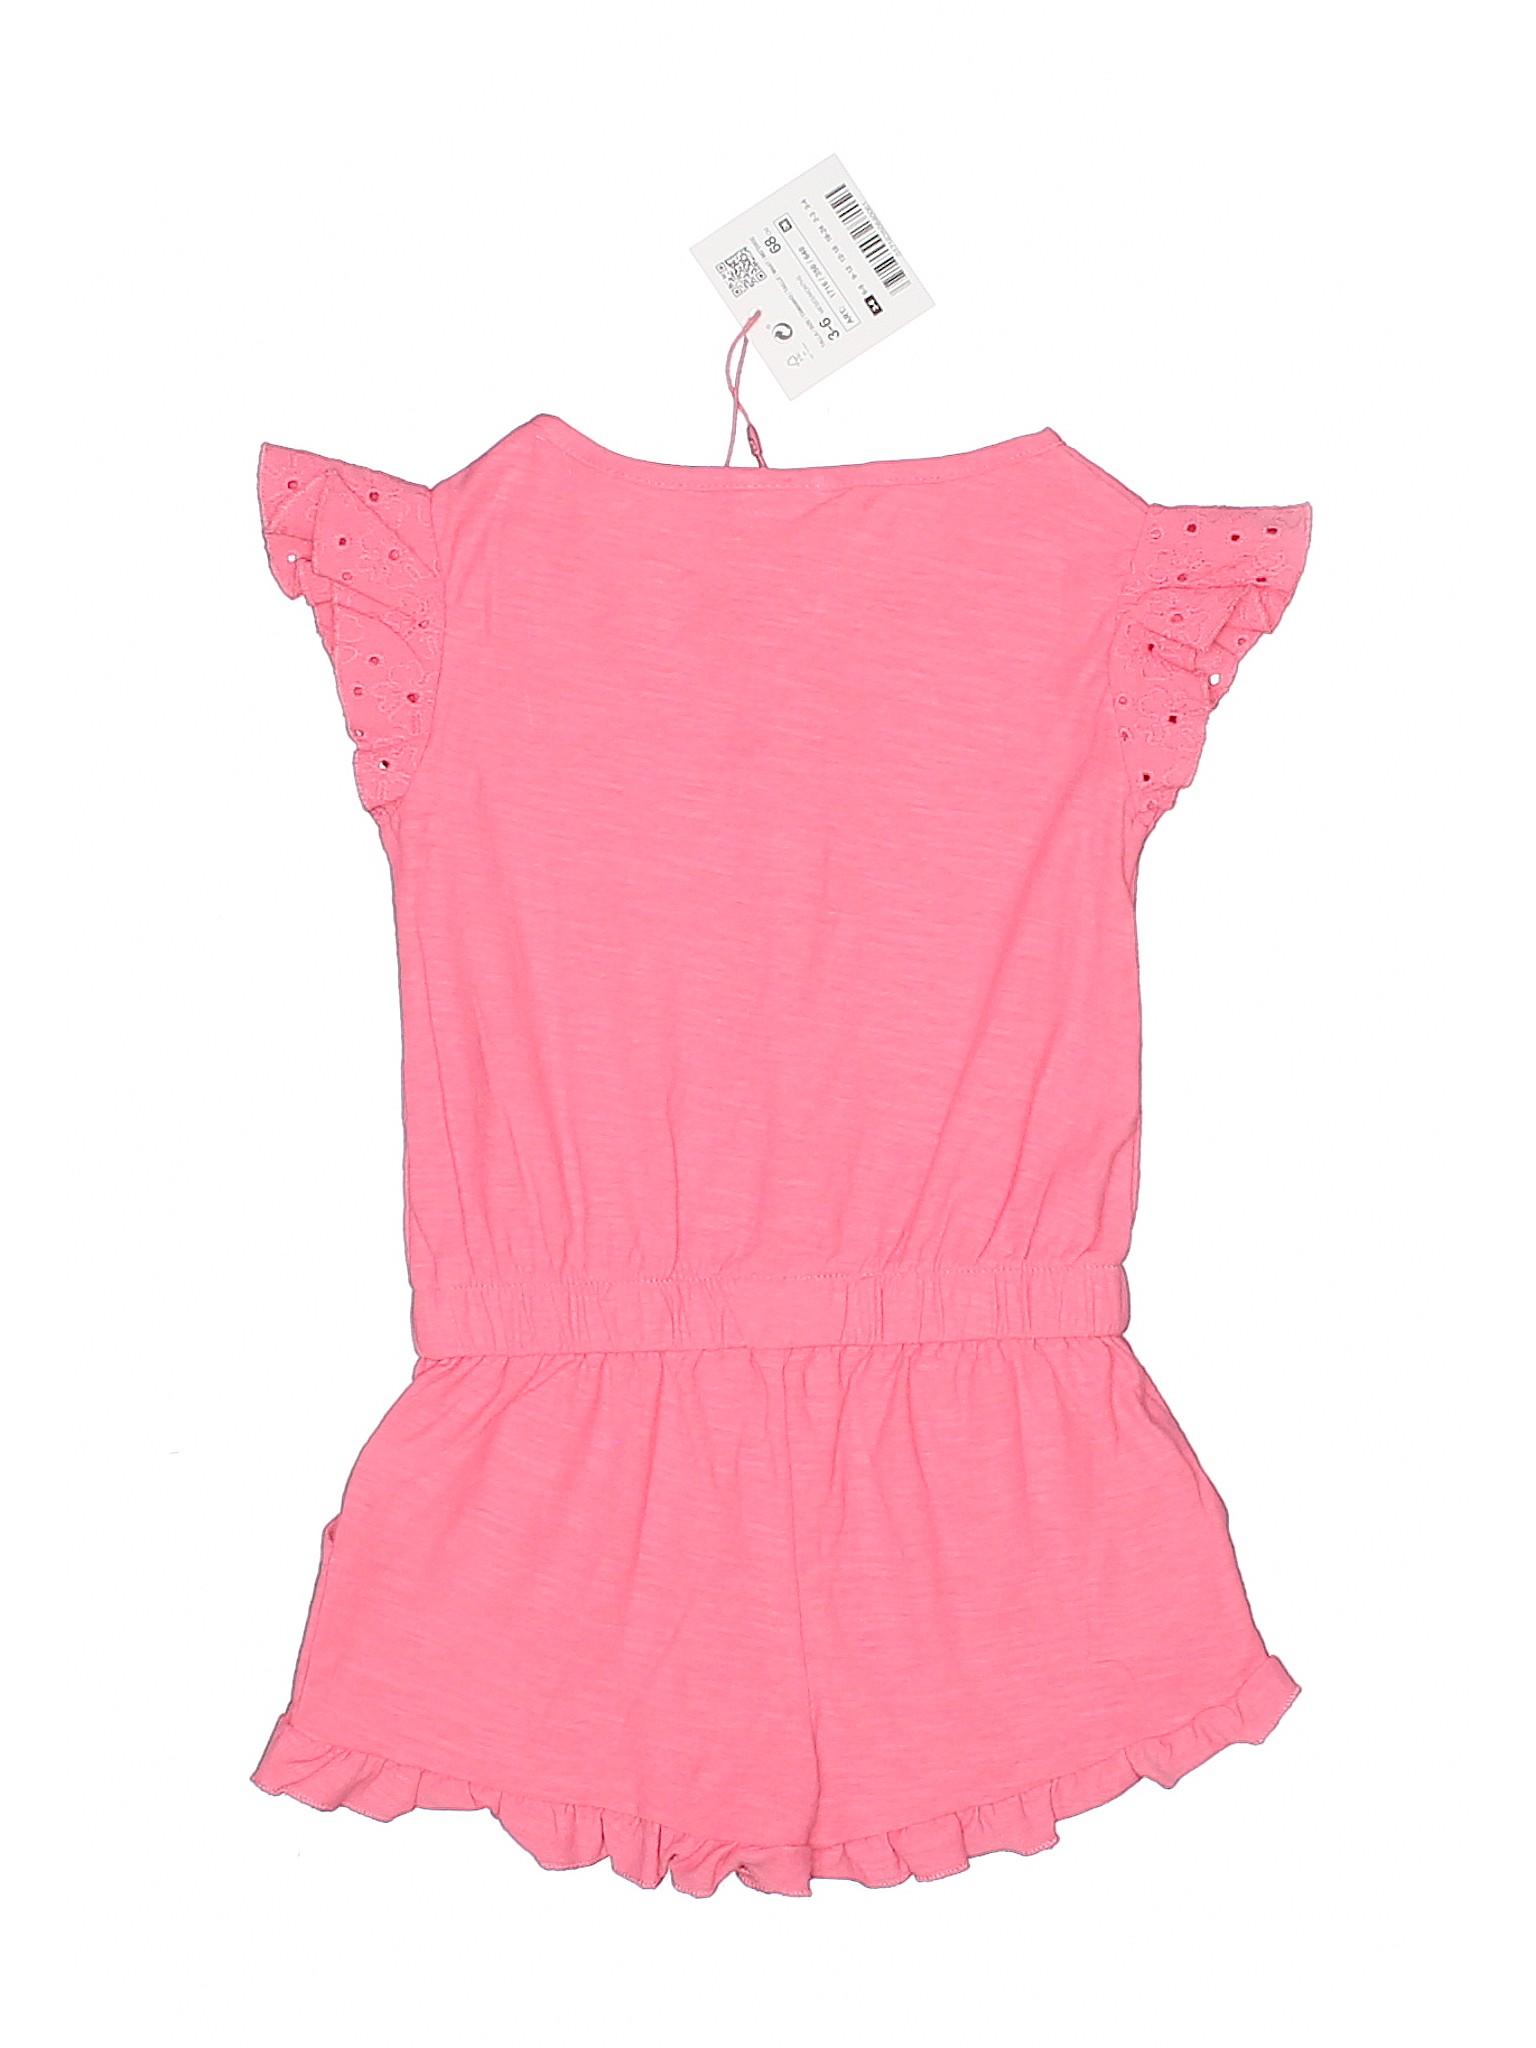 71ebcd68b0ba Zara 100% Cotton Solid Pink Romper Size 3-6 mo - 73% off